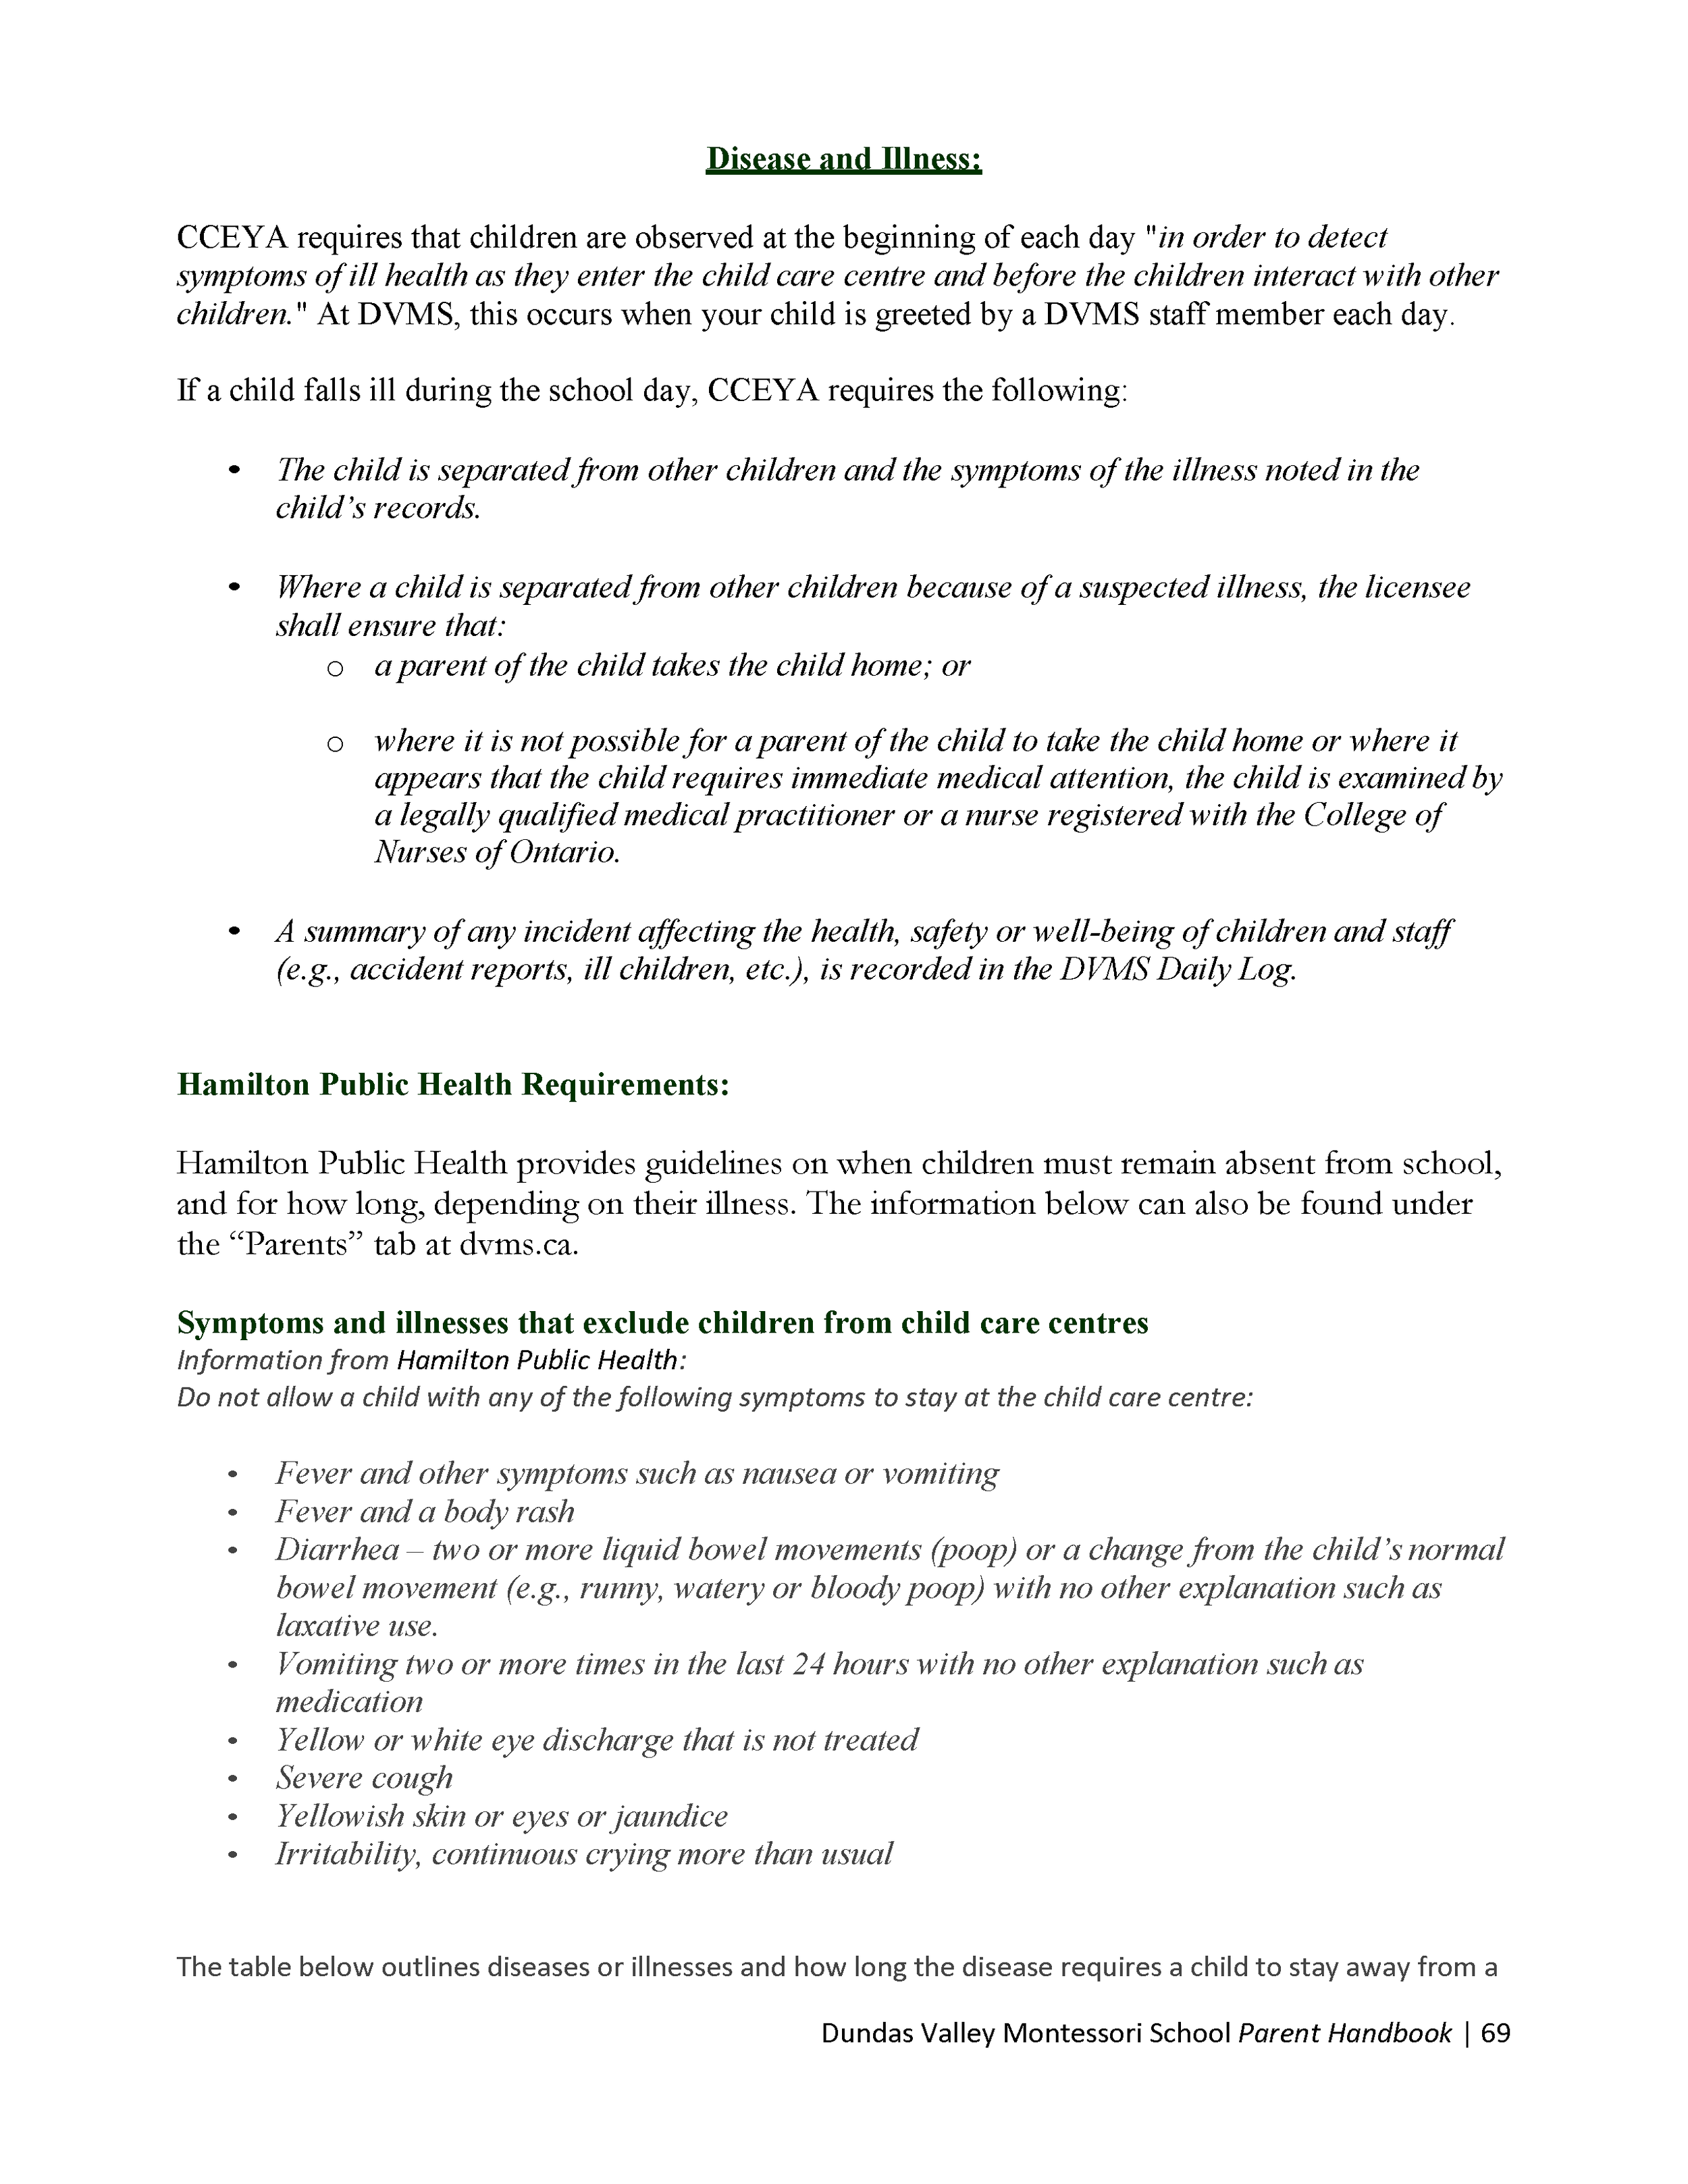 DVMS-Parent-Handbook-19-20_Page_071.png